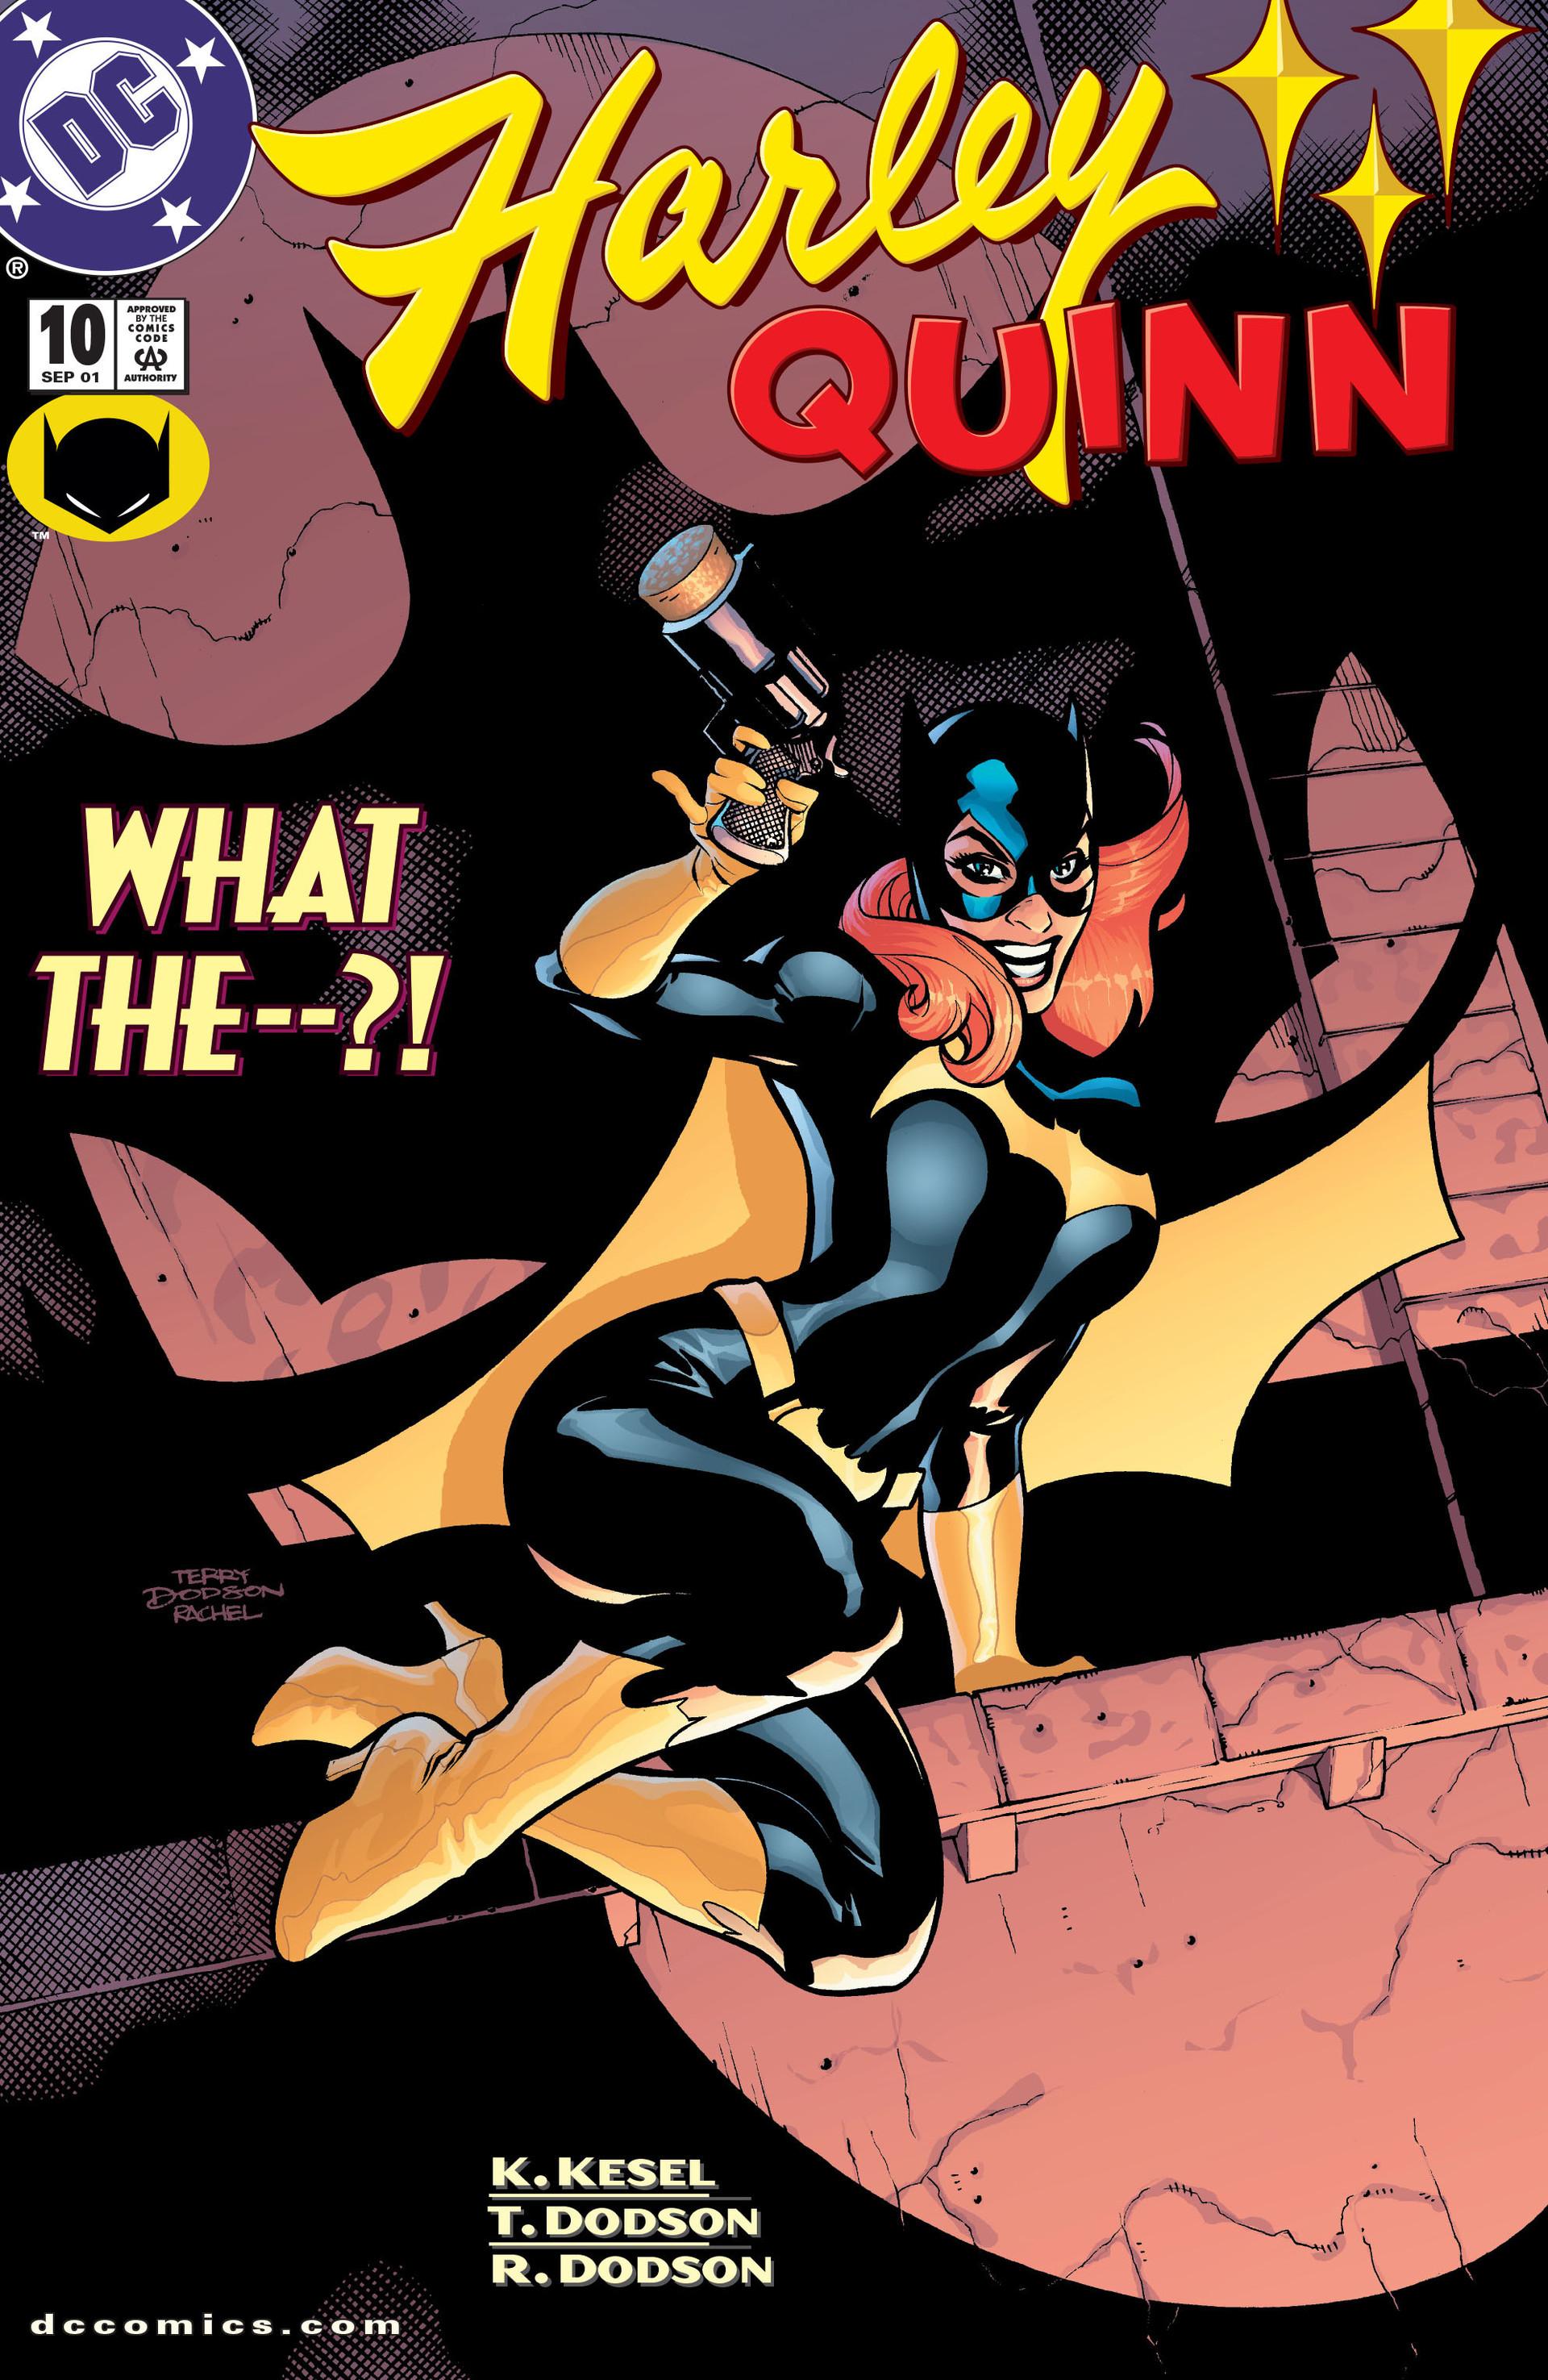 Harley Quinn Vol.1 #10